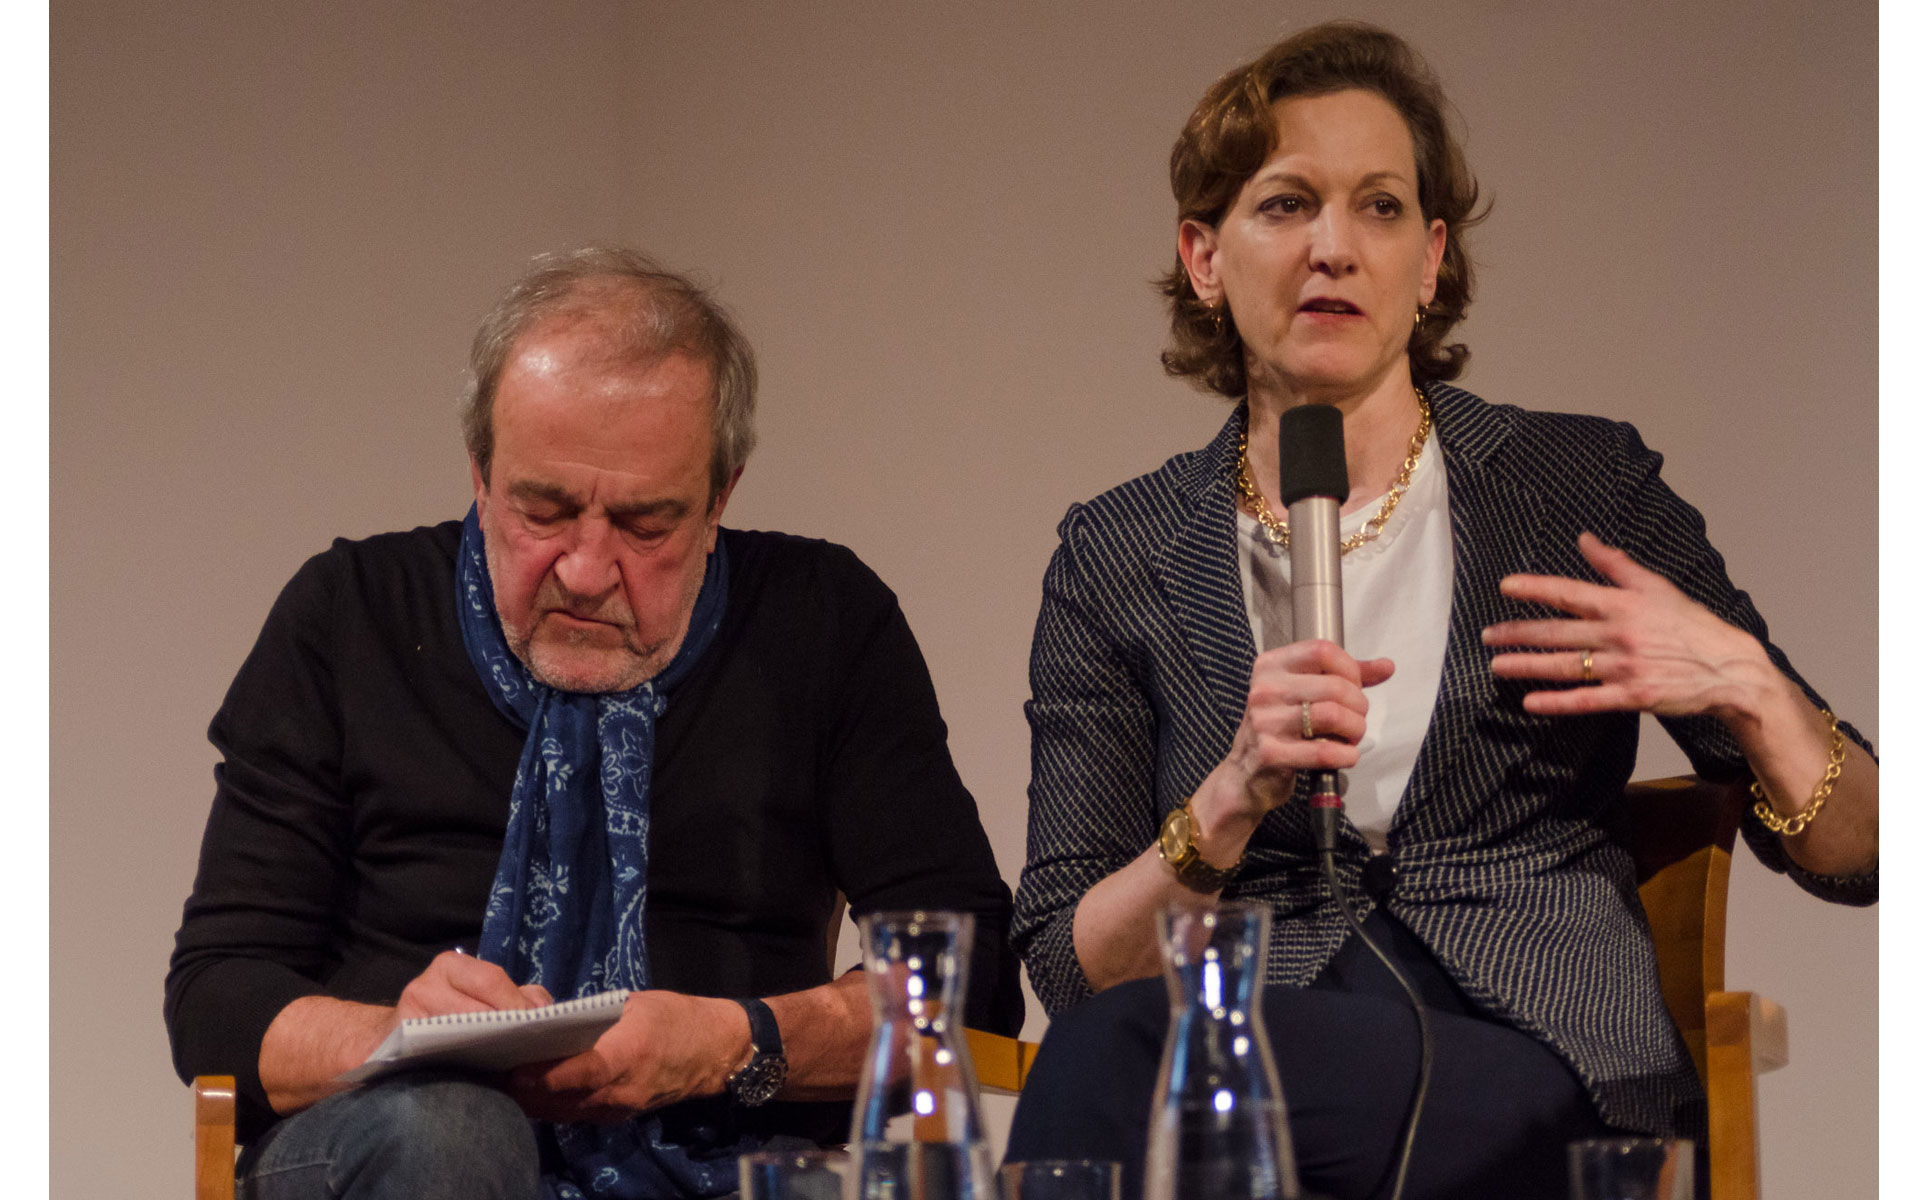 Anne Applebaum: Roter Hunger,                                                               Dienstag, 30.04.19               /                   19.30              Uhr                               <br/>(c) Simon Adolphi